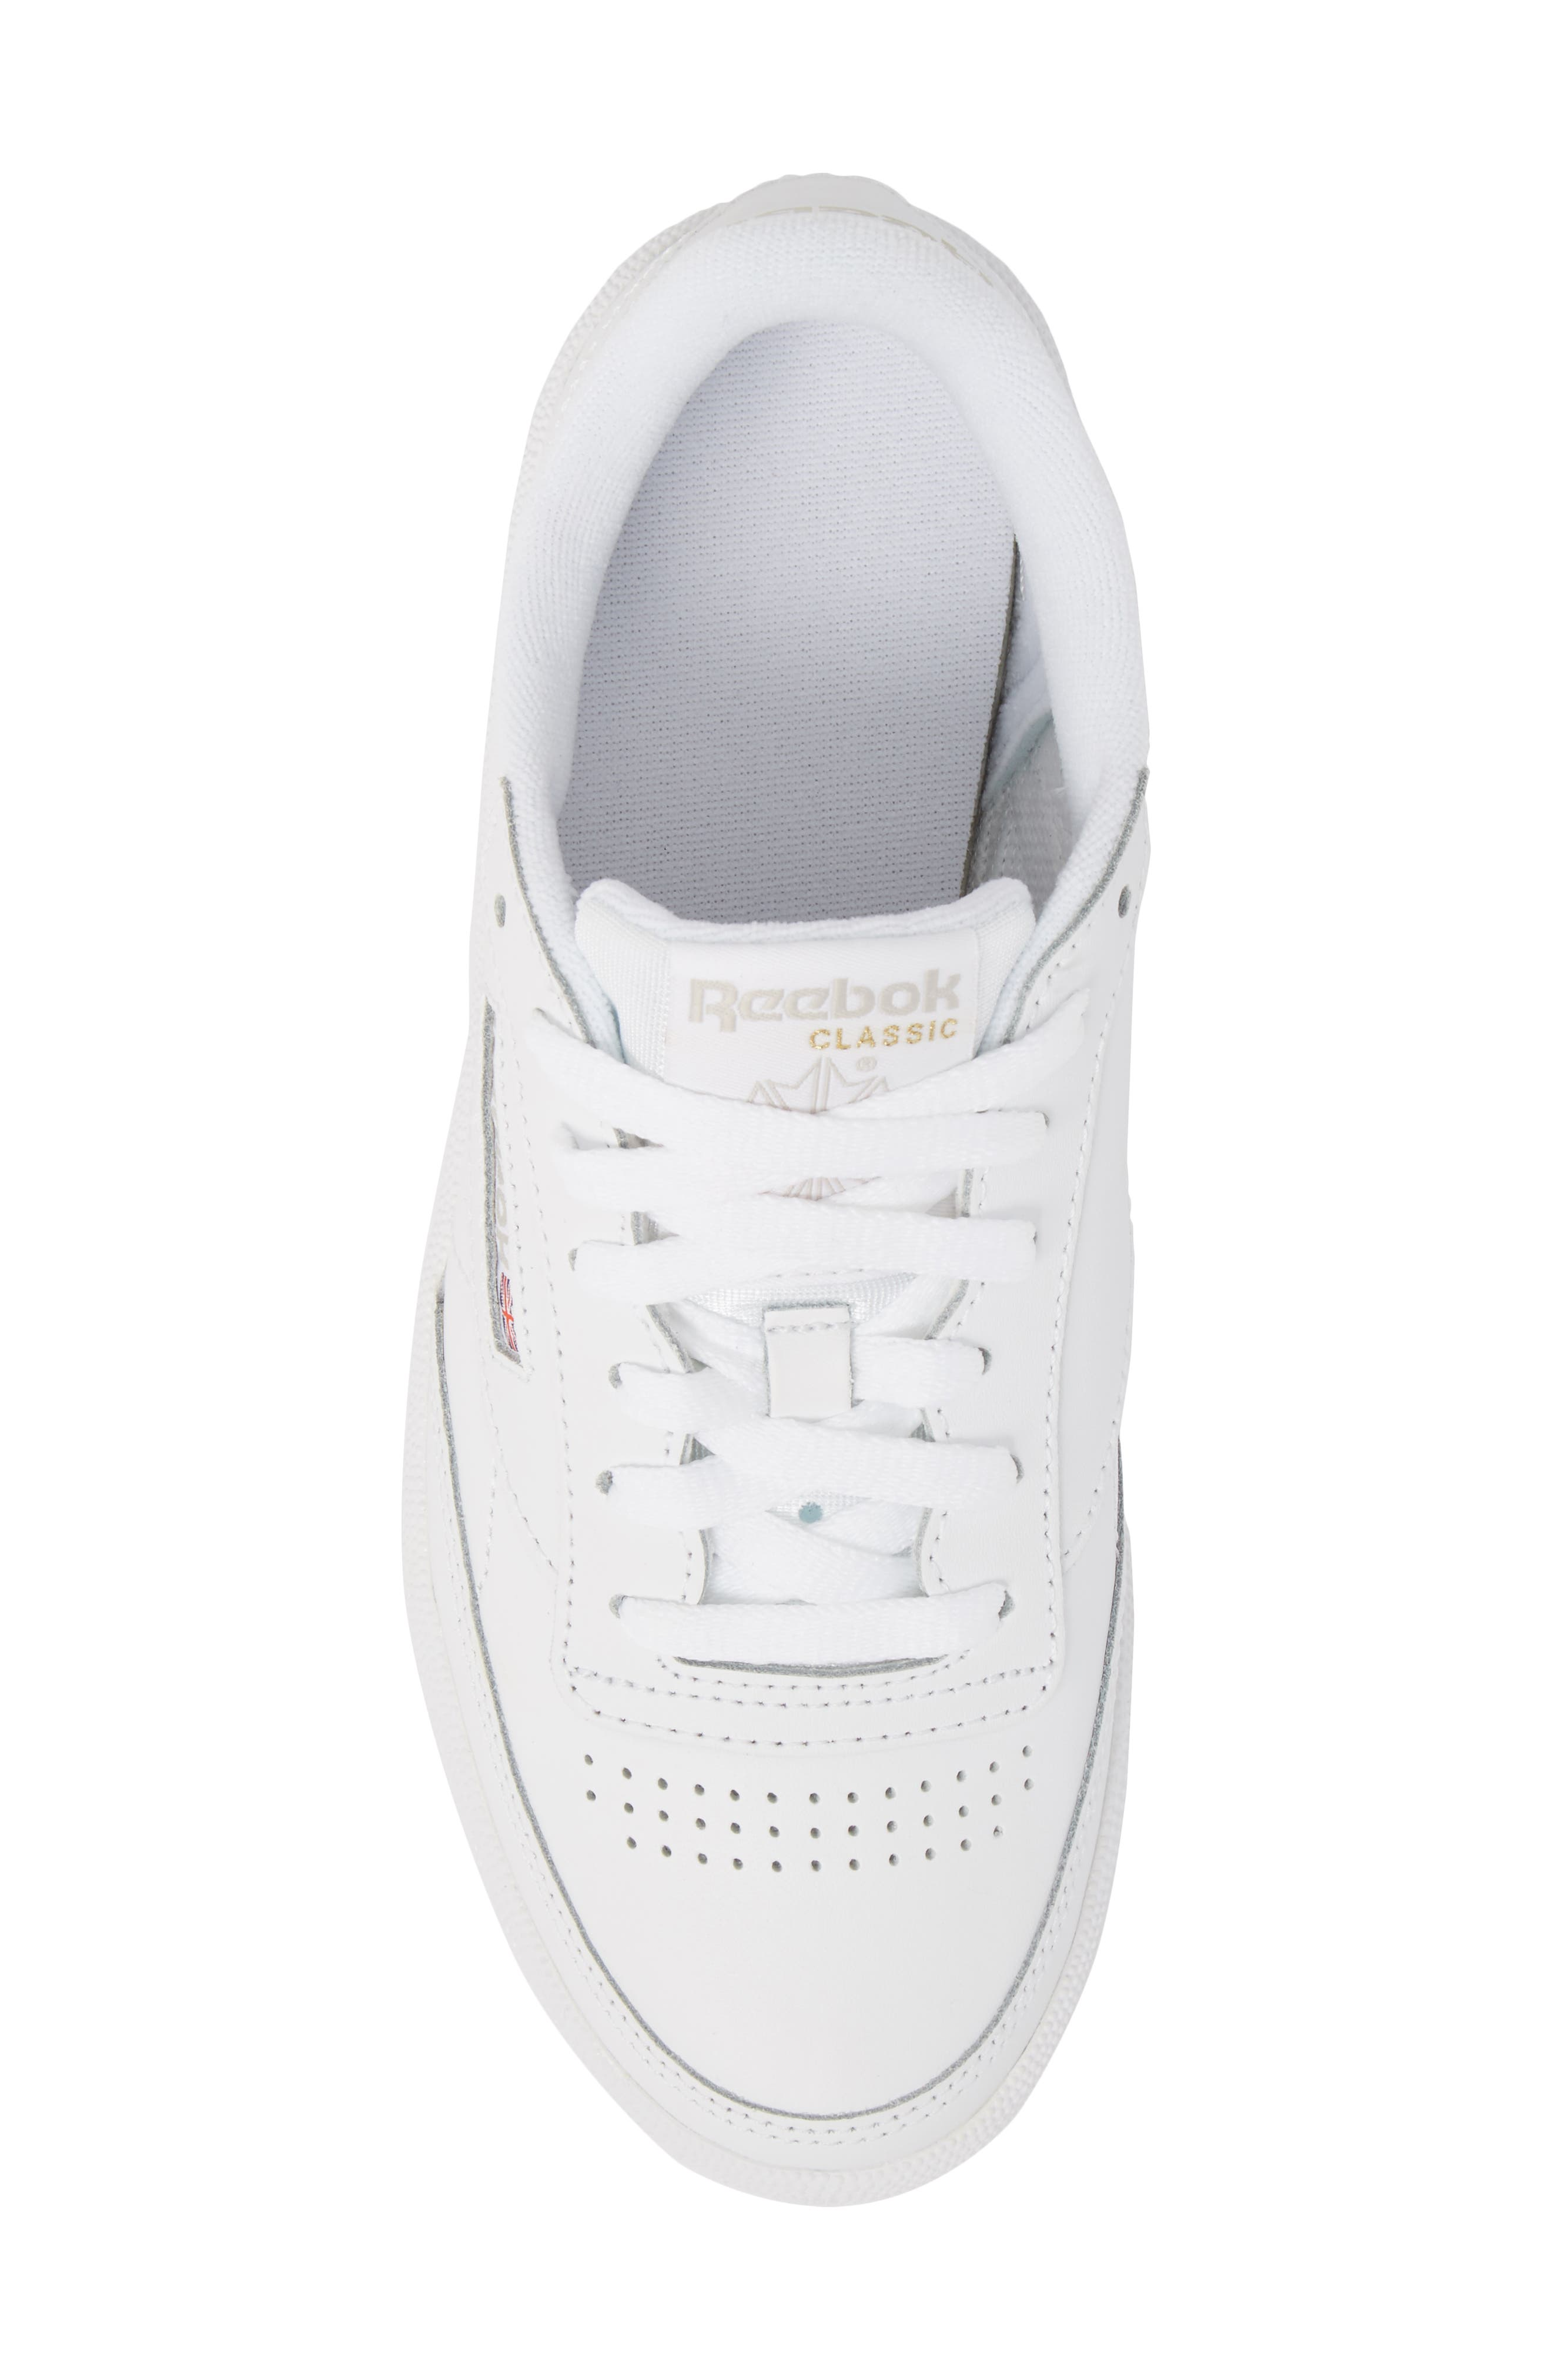 Club C 85 Sneaker,                             Alternate thumbnail 5, color,                             WHITE/ LIGHT GREY